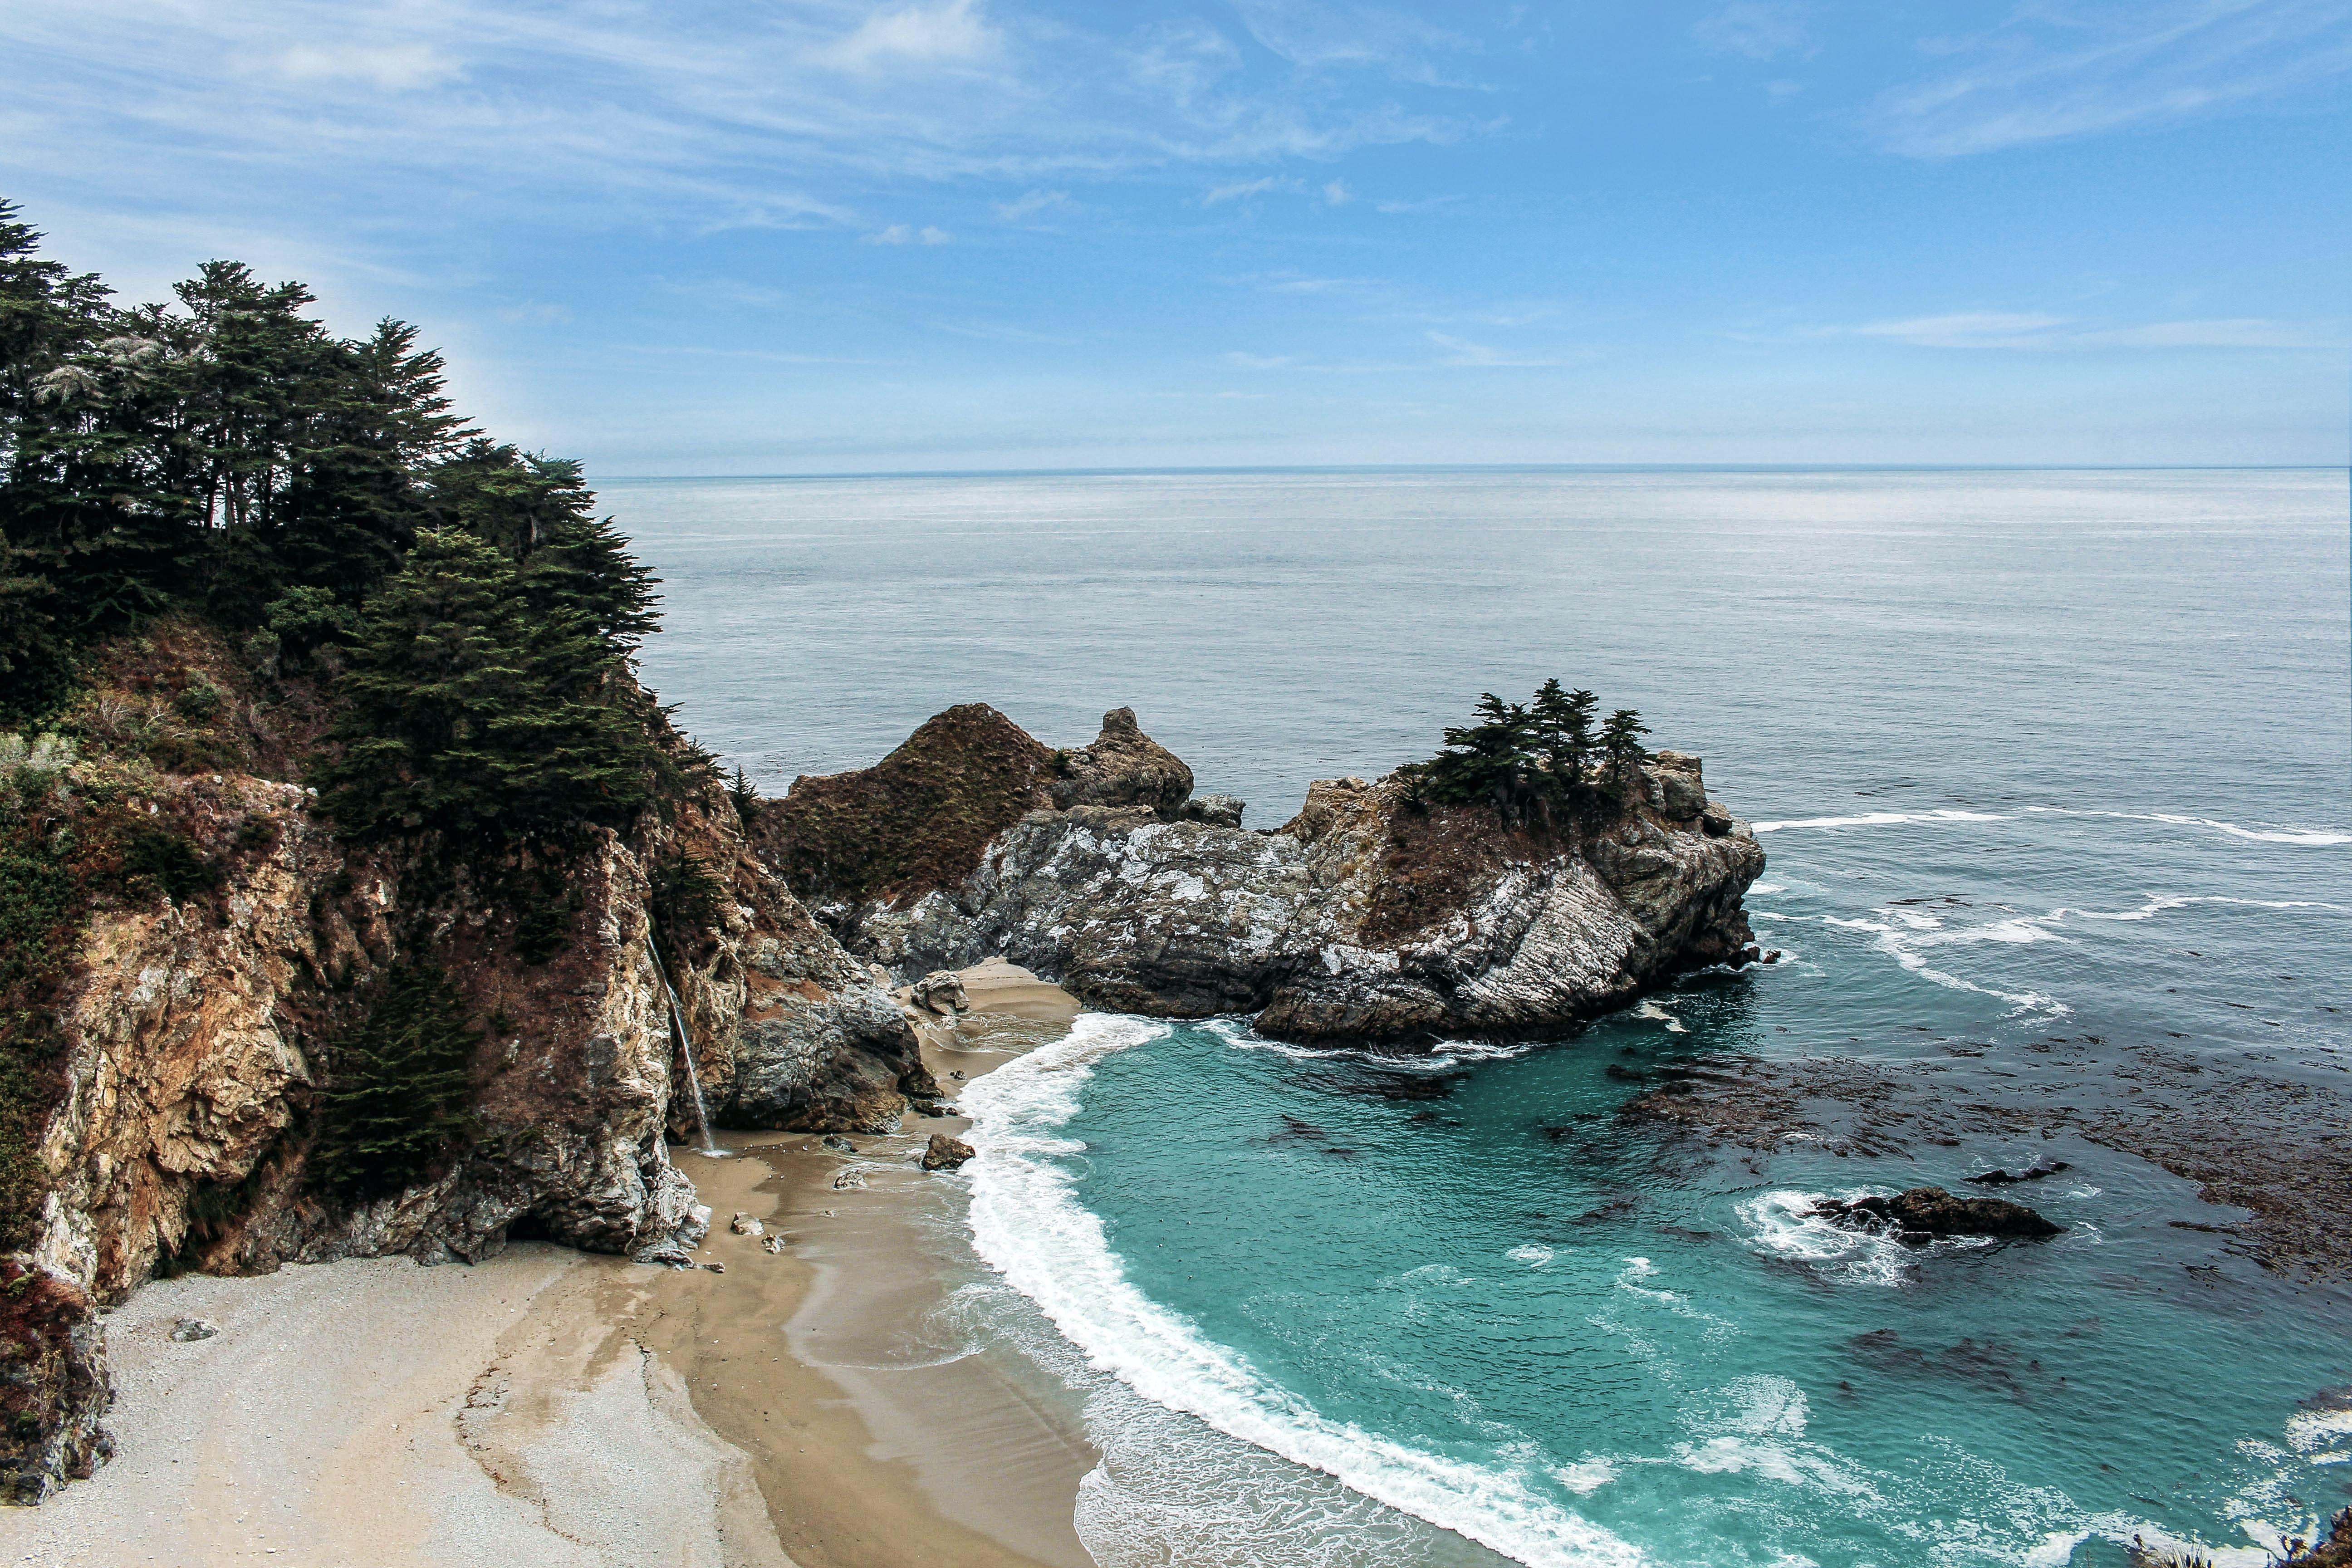 Beach Shore Coast And Rock Hd Photo By Joe Caione